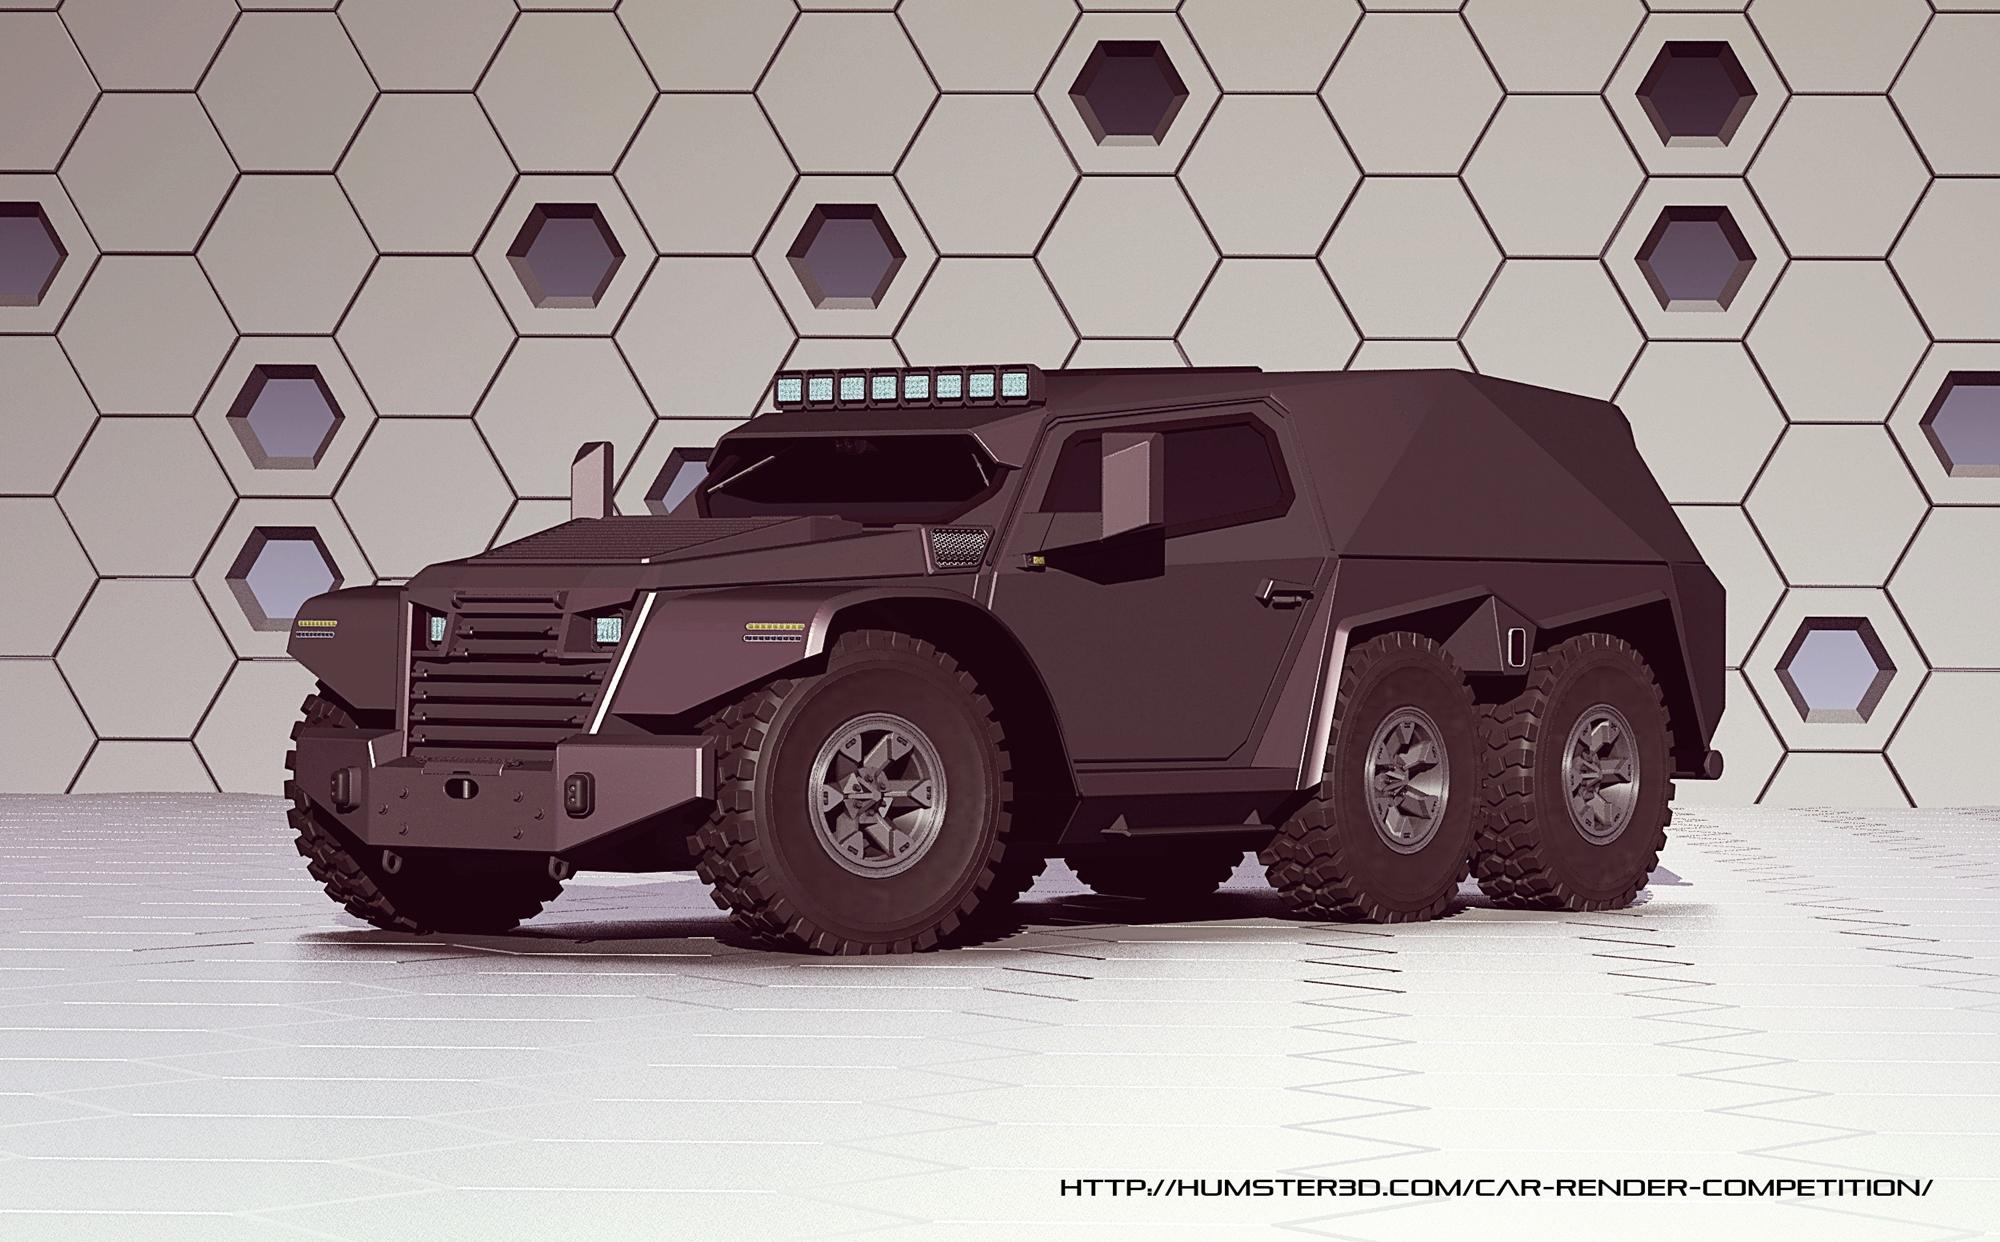 Luxury Armored Vehicles: Luxury Armored Vehicle